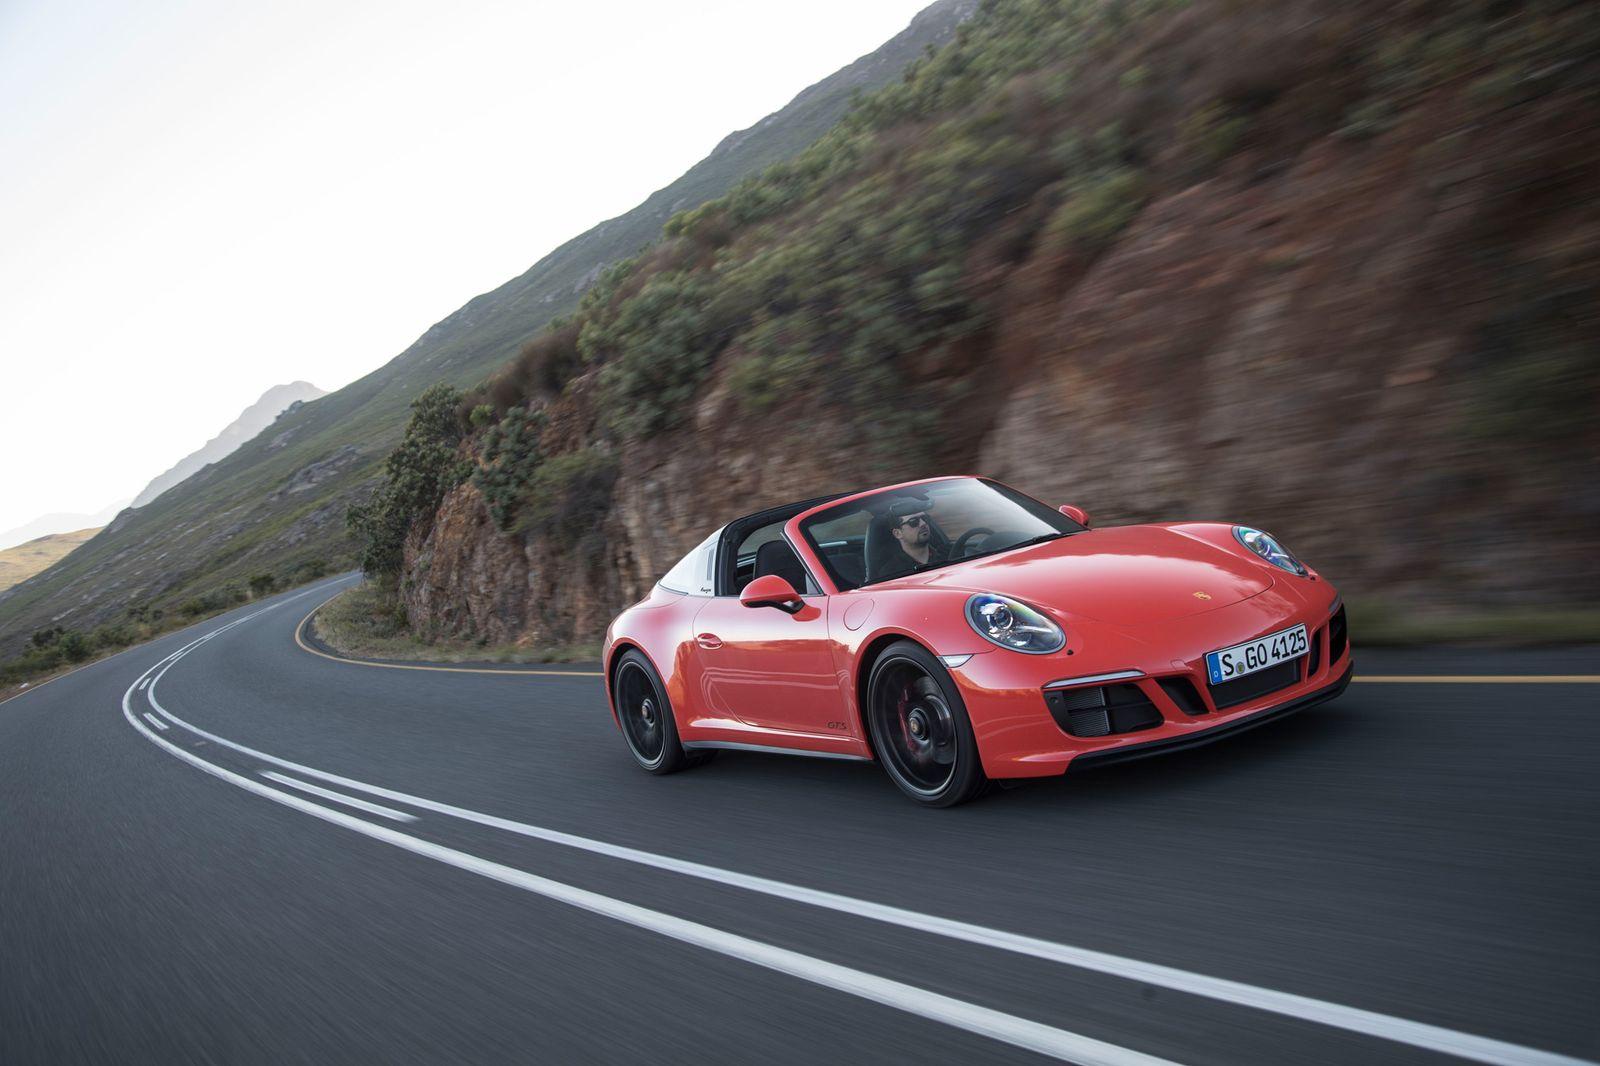 2017 / Porsche 911 GTS